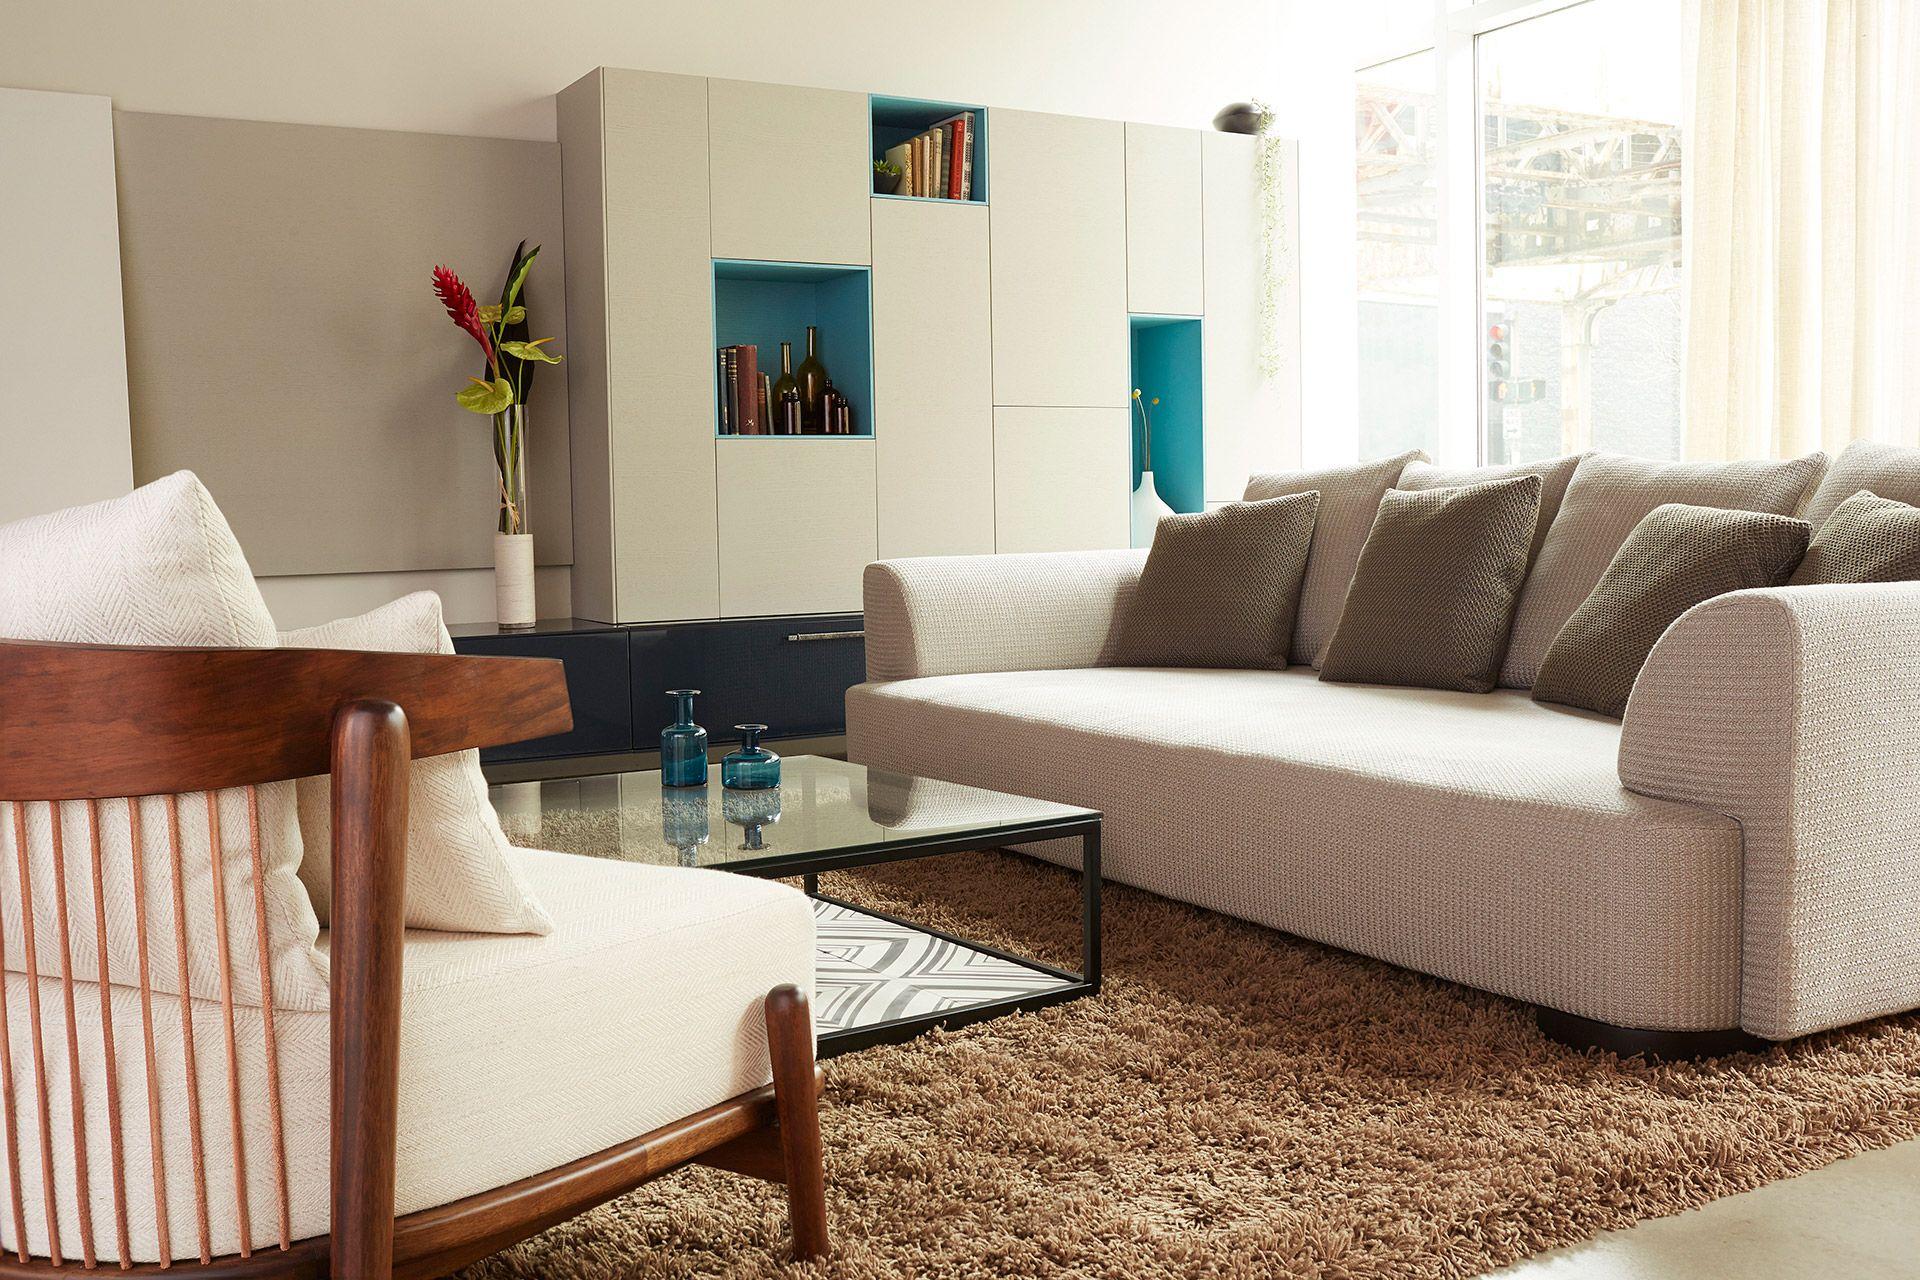 Florense Vice Versa wall unit Astor sofa Lidoca chair and Tile